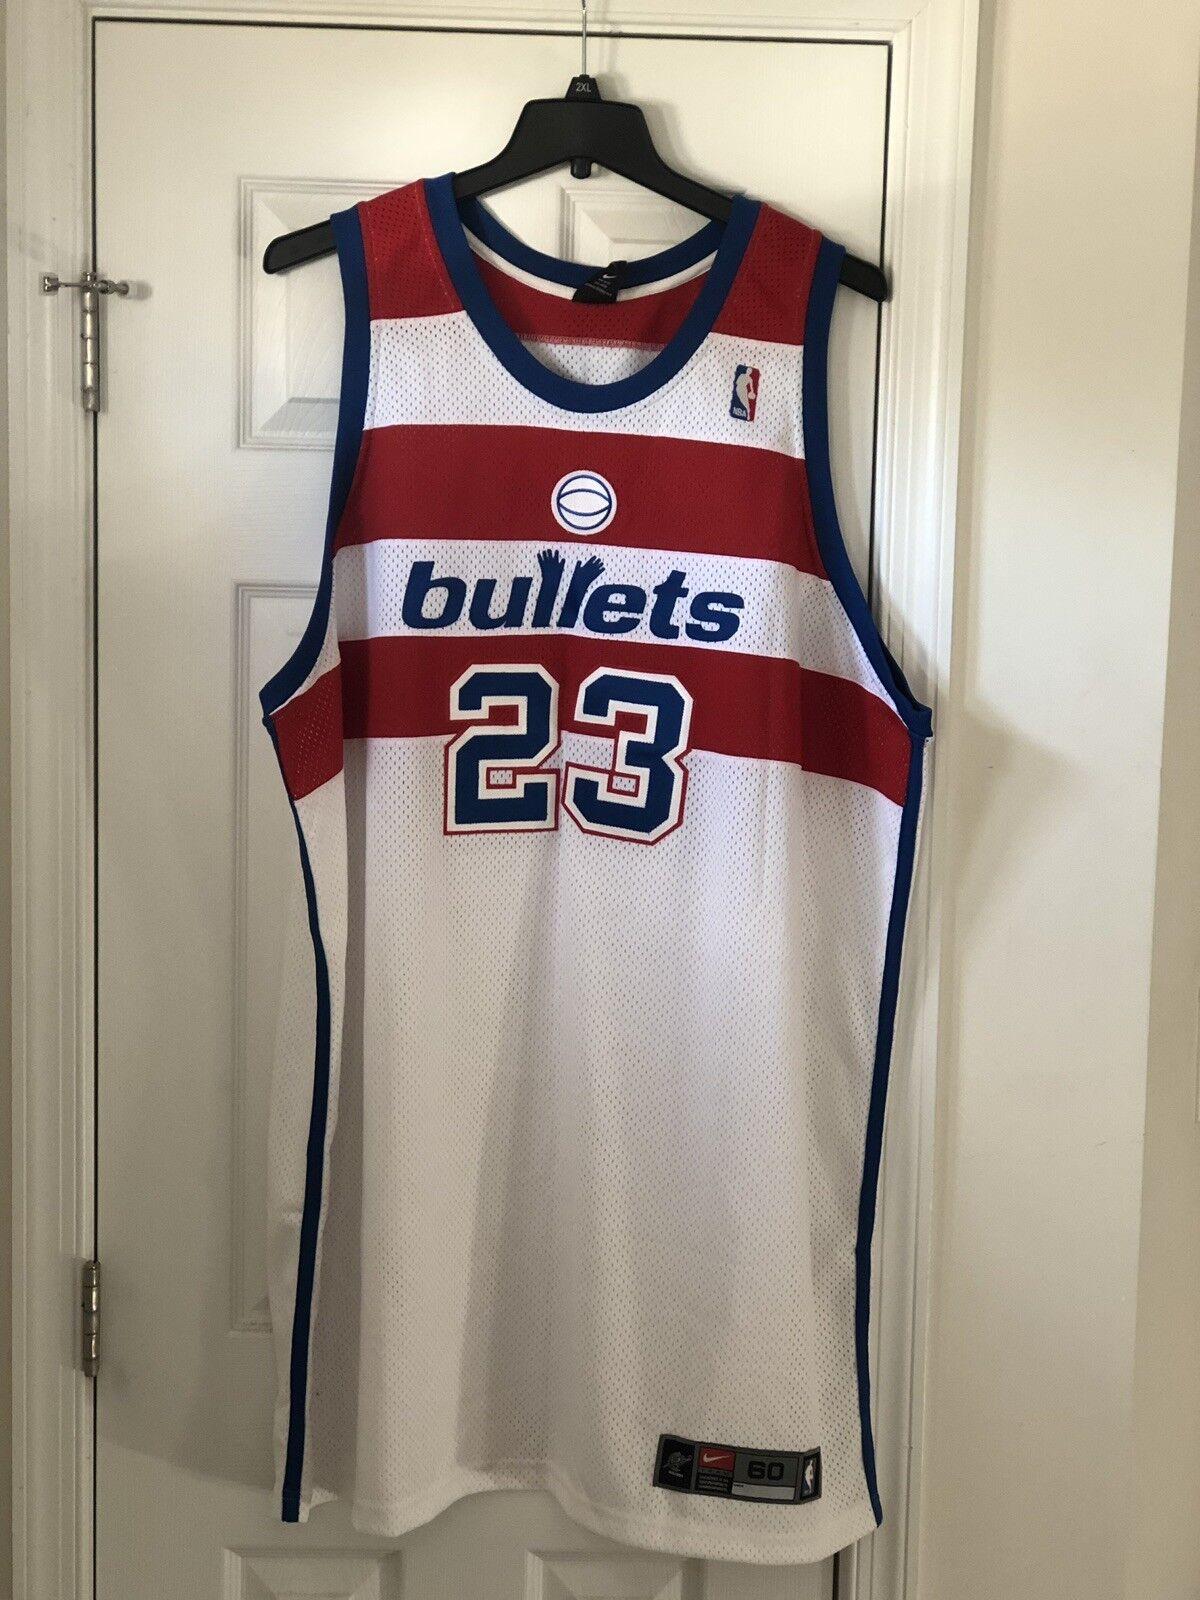 info for d6a95 b8fd0 Nike Authentic Michael Jordan Washington Bullets Wizards Jersey 60